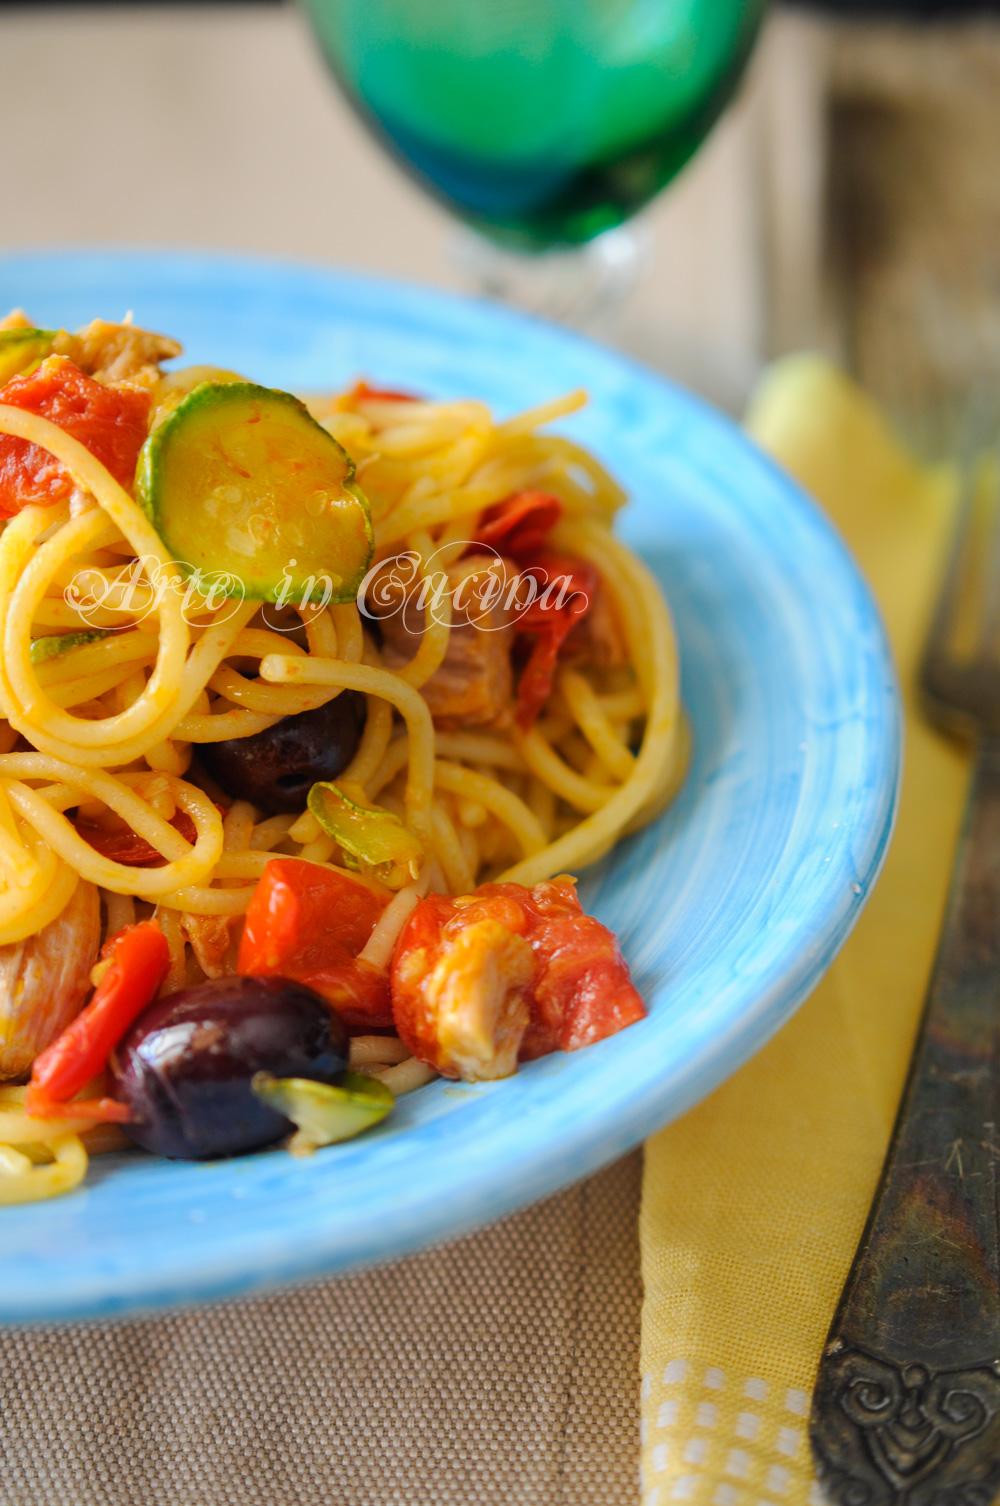 Spaghetti zucchine tonno e olive ricetta veloce vickyart arte in cucina